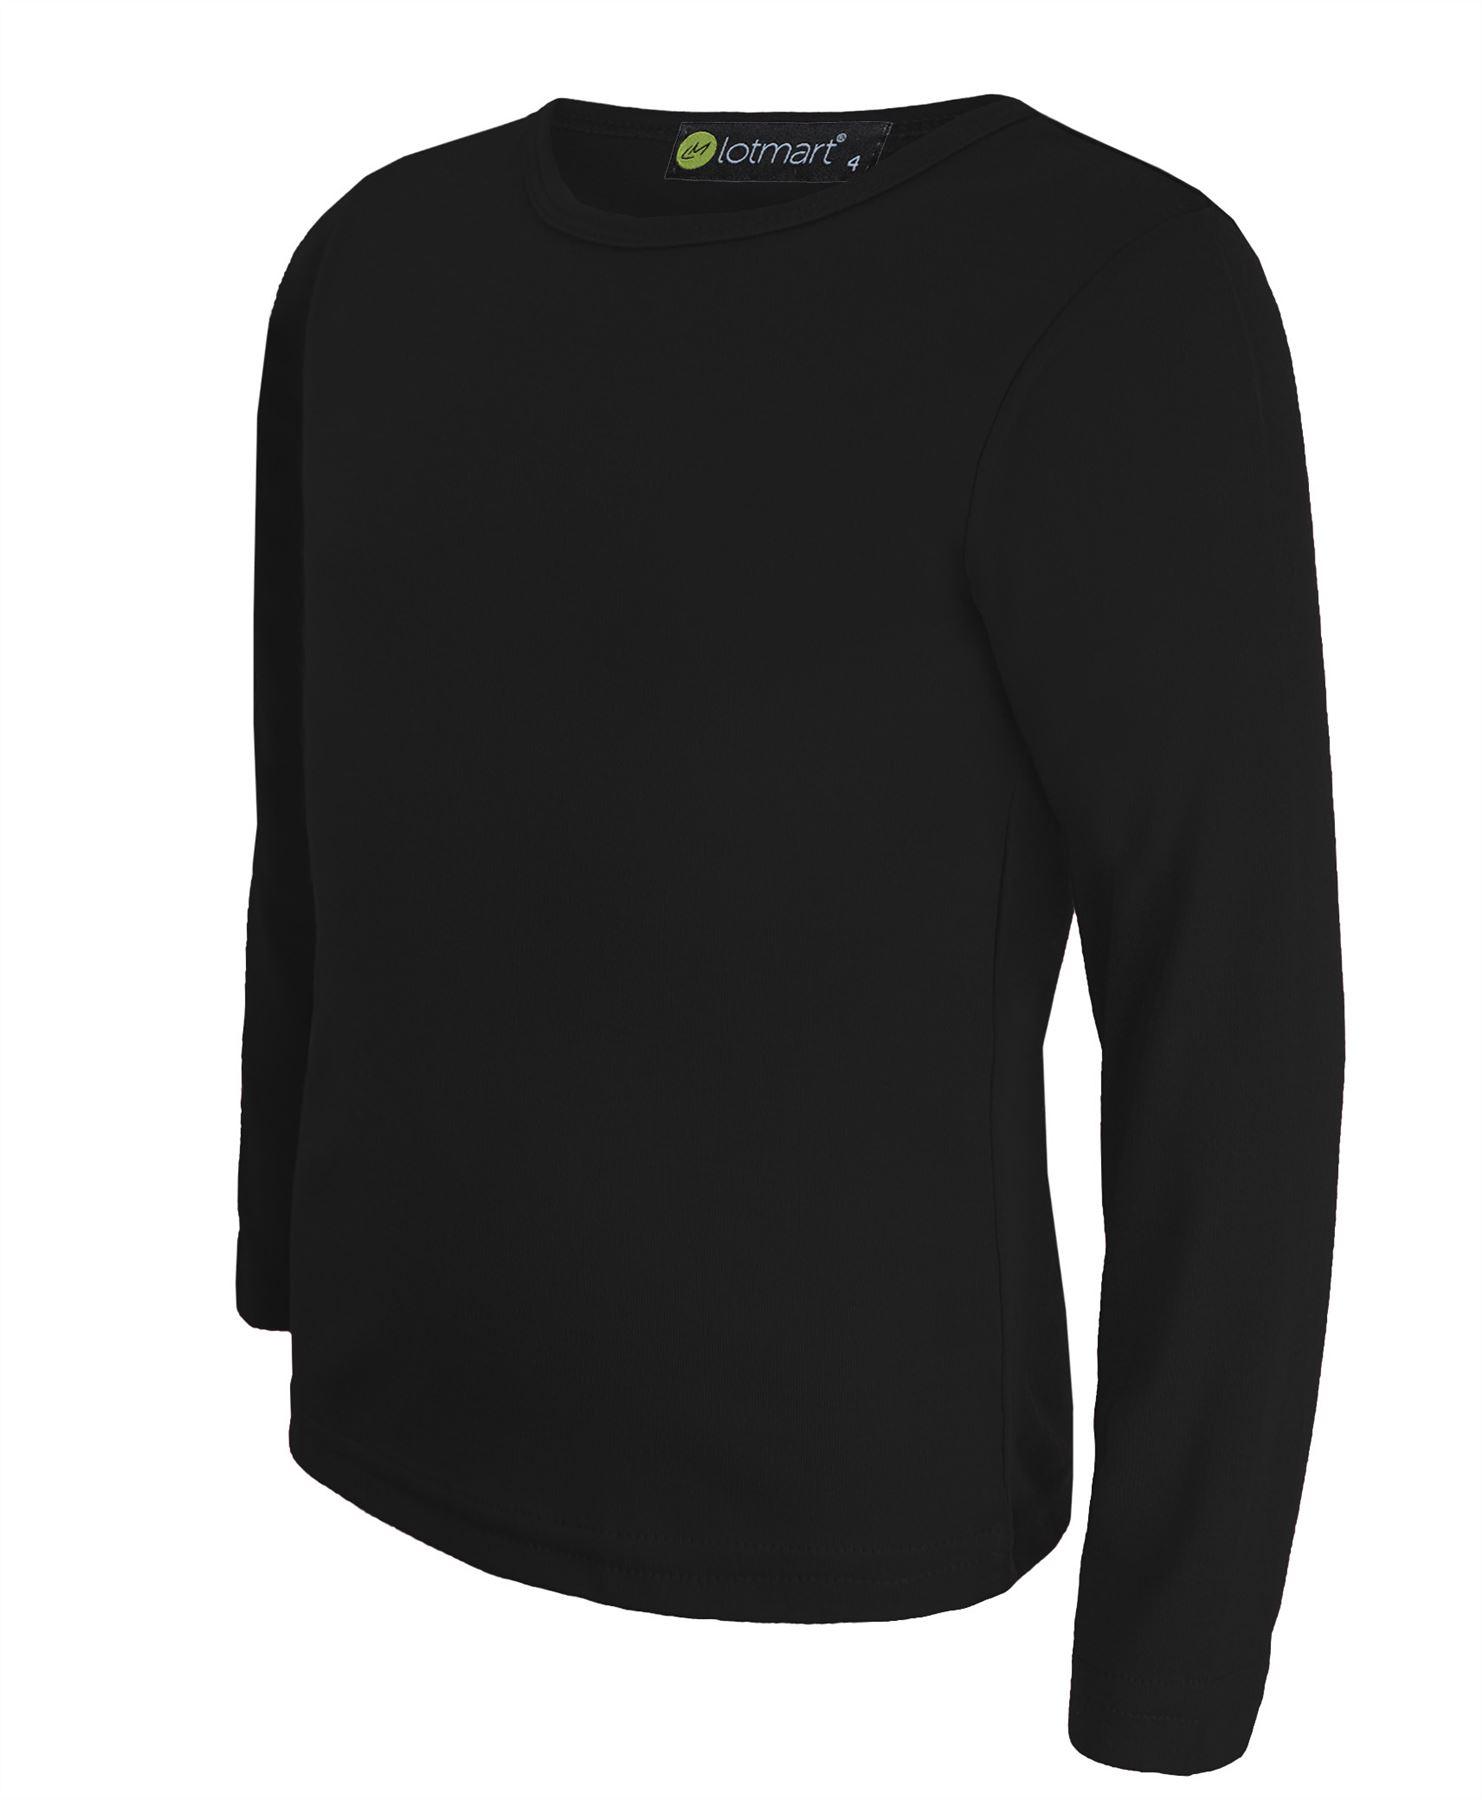 PIRATES blue black white thin cotton t-shirt 116 cm  6years  6 shirt long sleeves t-shirt for boy,organic cotton,baby girl clothes